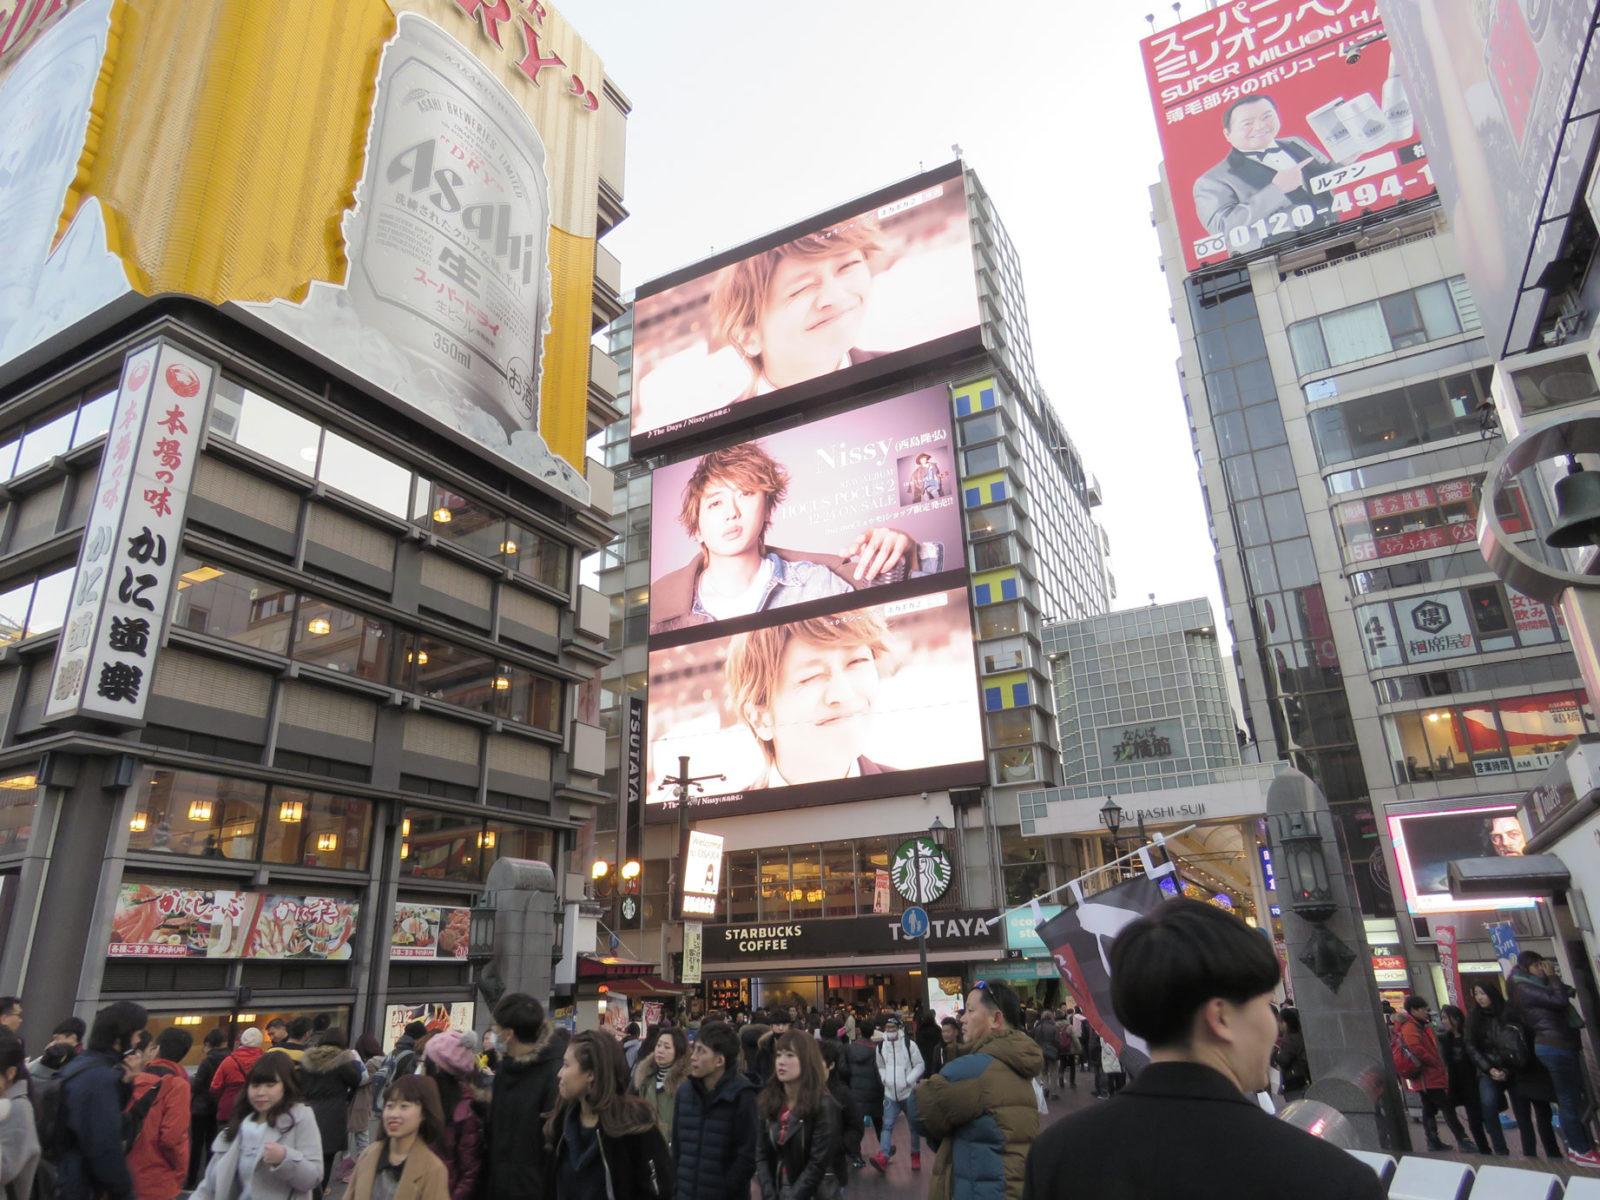 Nissy(西島隆弘)、12月24日リリース『HOCUS POCUS 2』のスポット映像が全国の街頭大型ビジョンに登場サムネイル画像